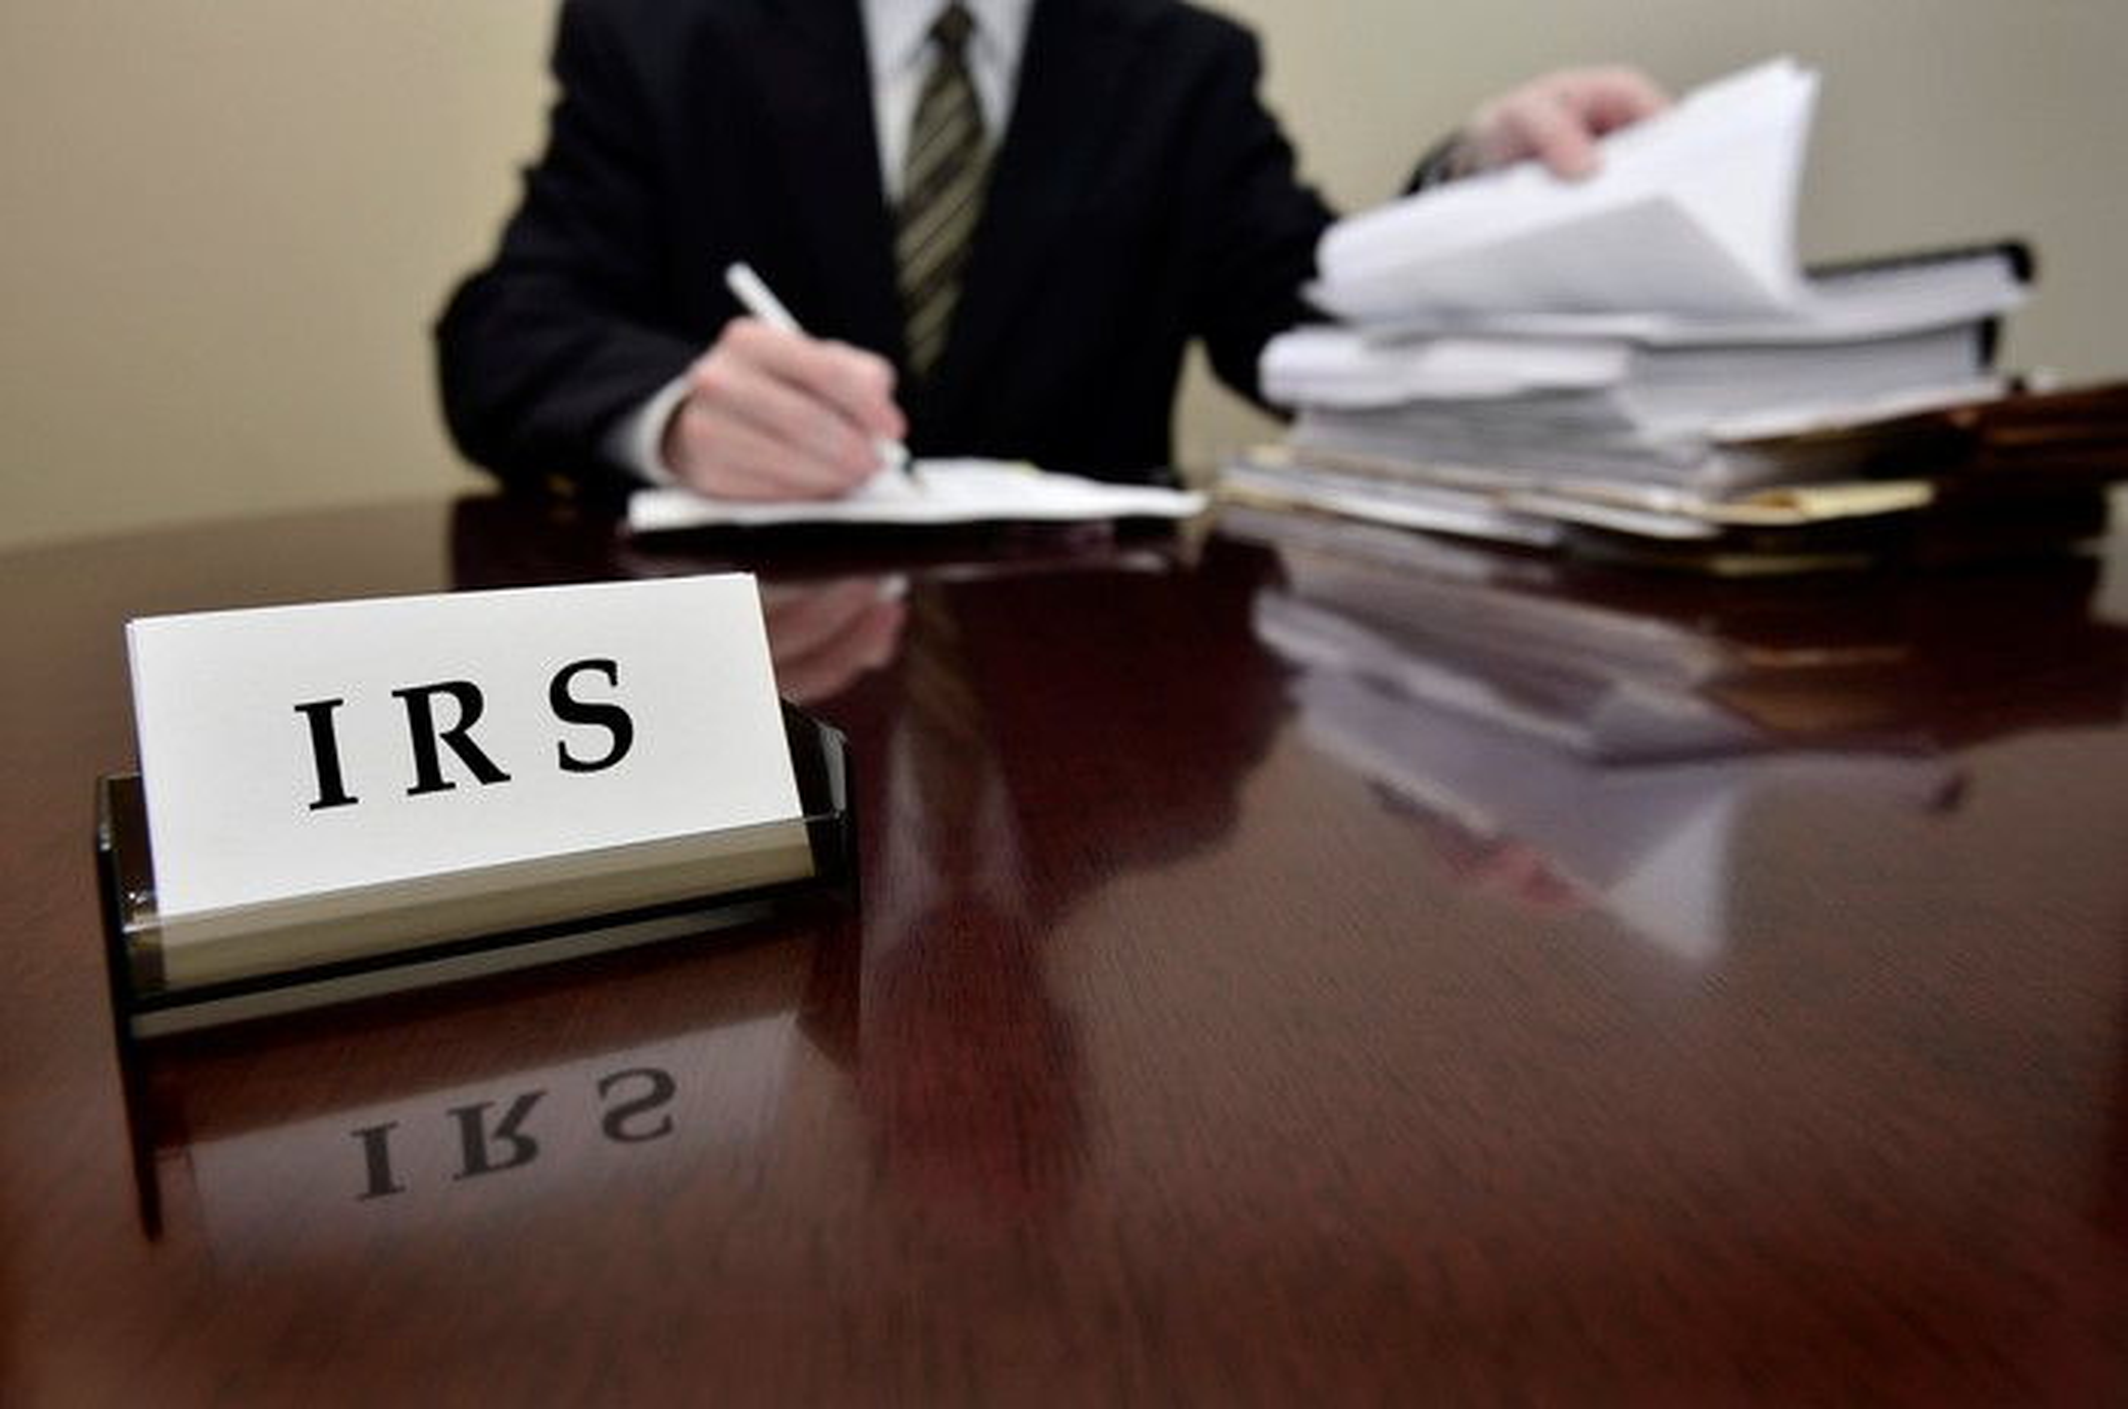 An IRS tax auditor examining returns at his desk.